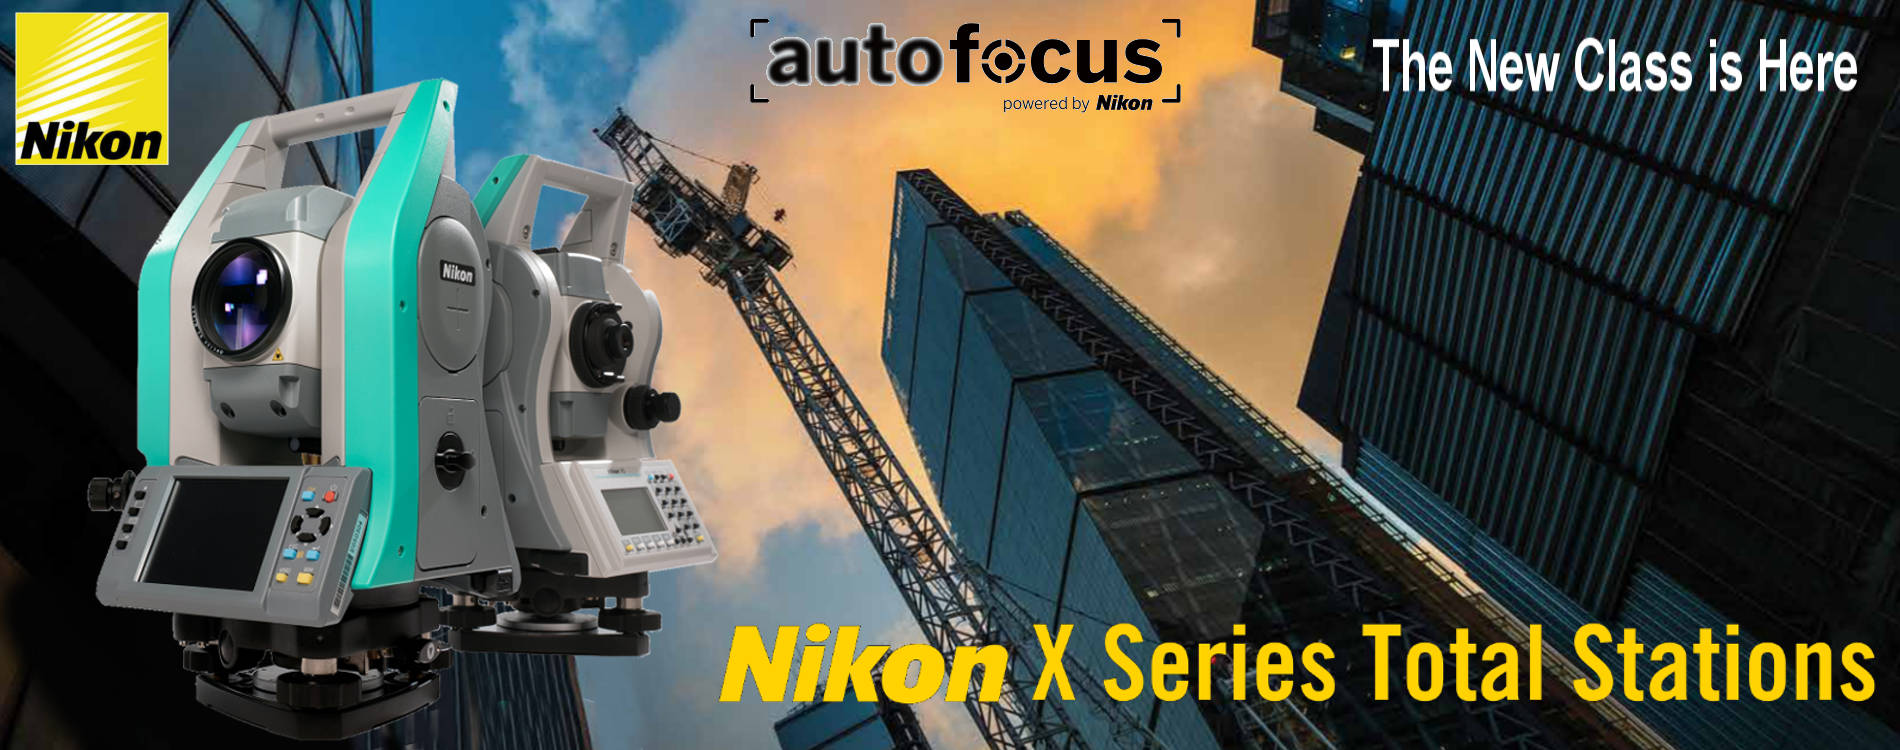 Nikon X-series